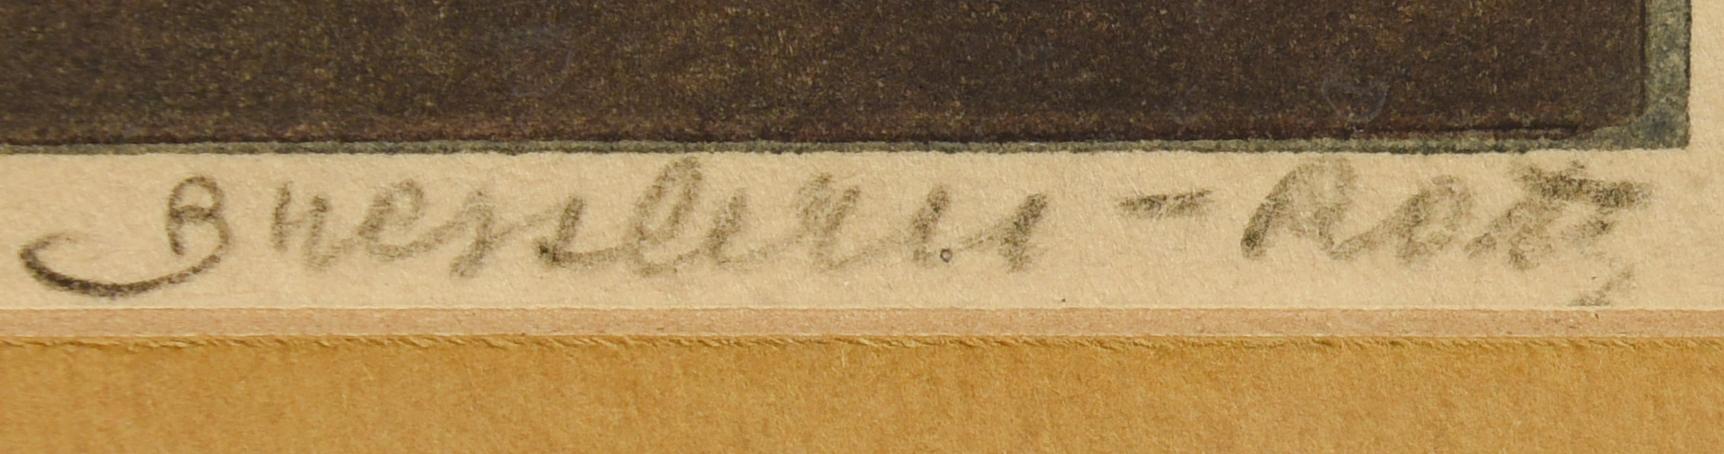 Lot 182: Signed Bresslern-Roth Linocut of Kittens